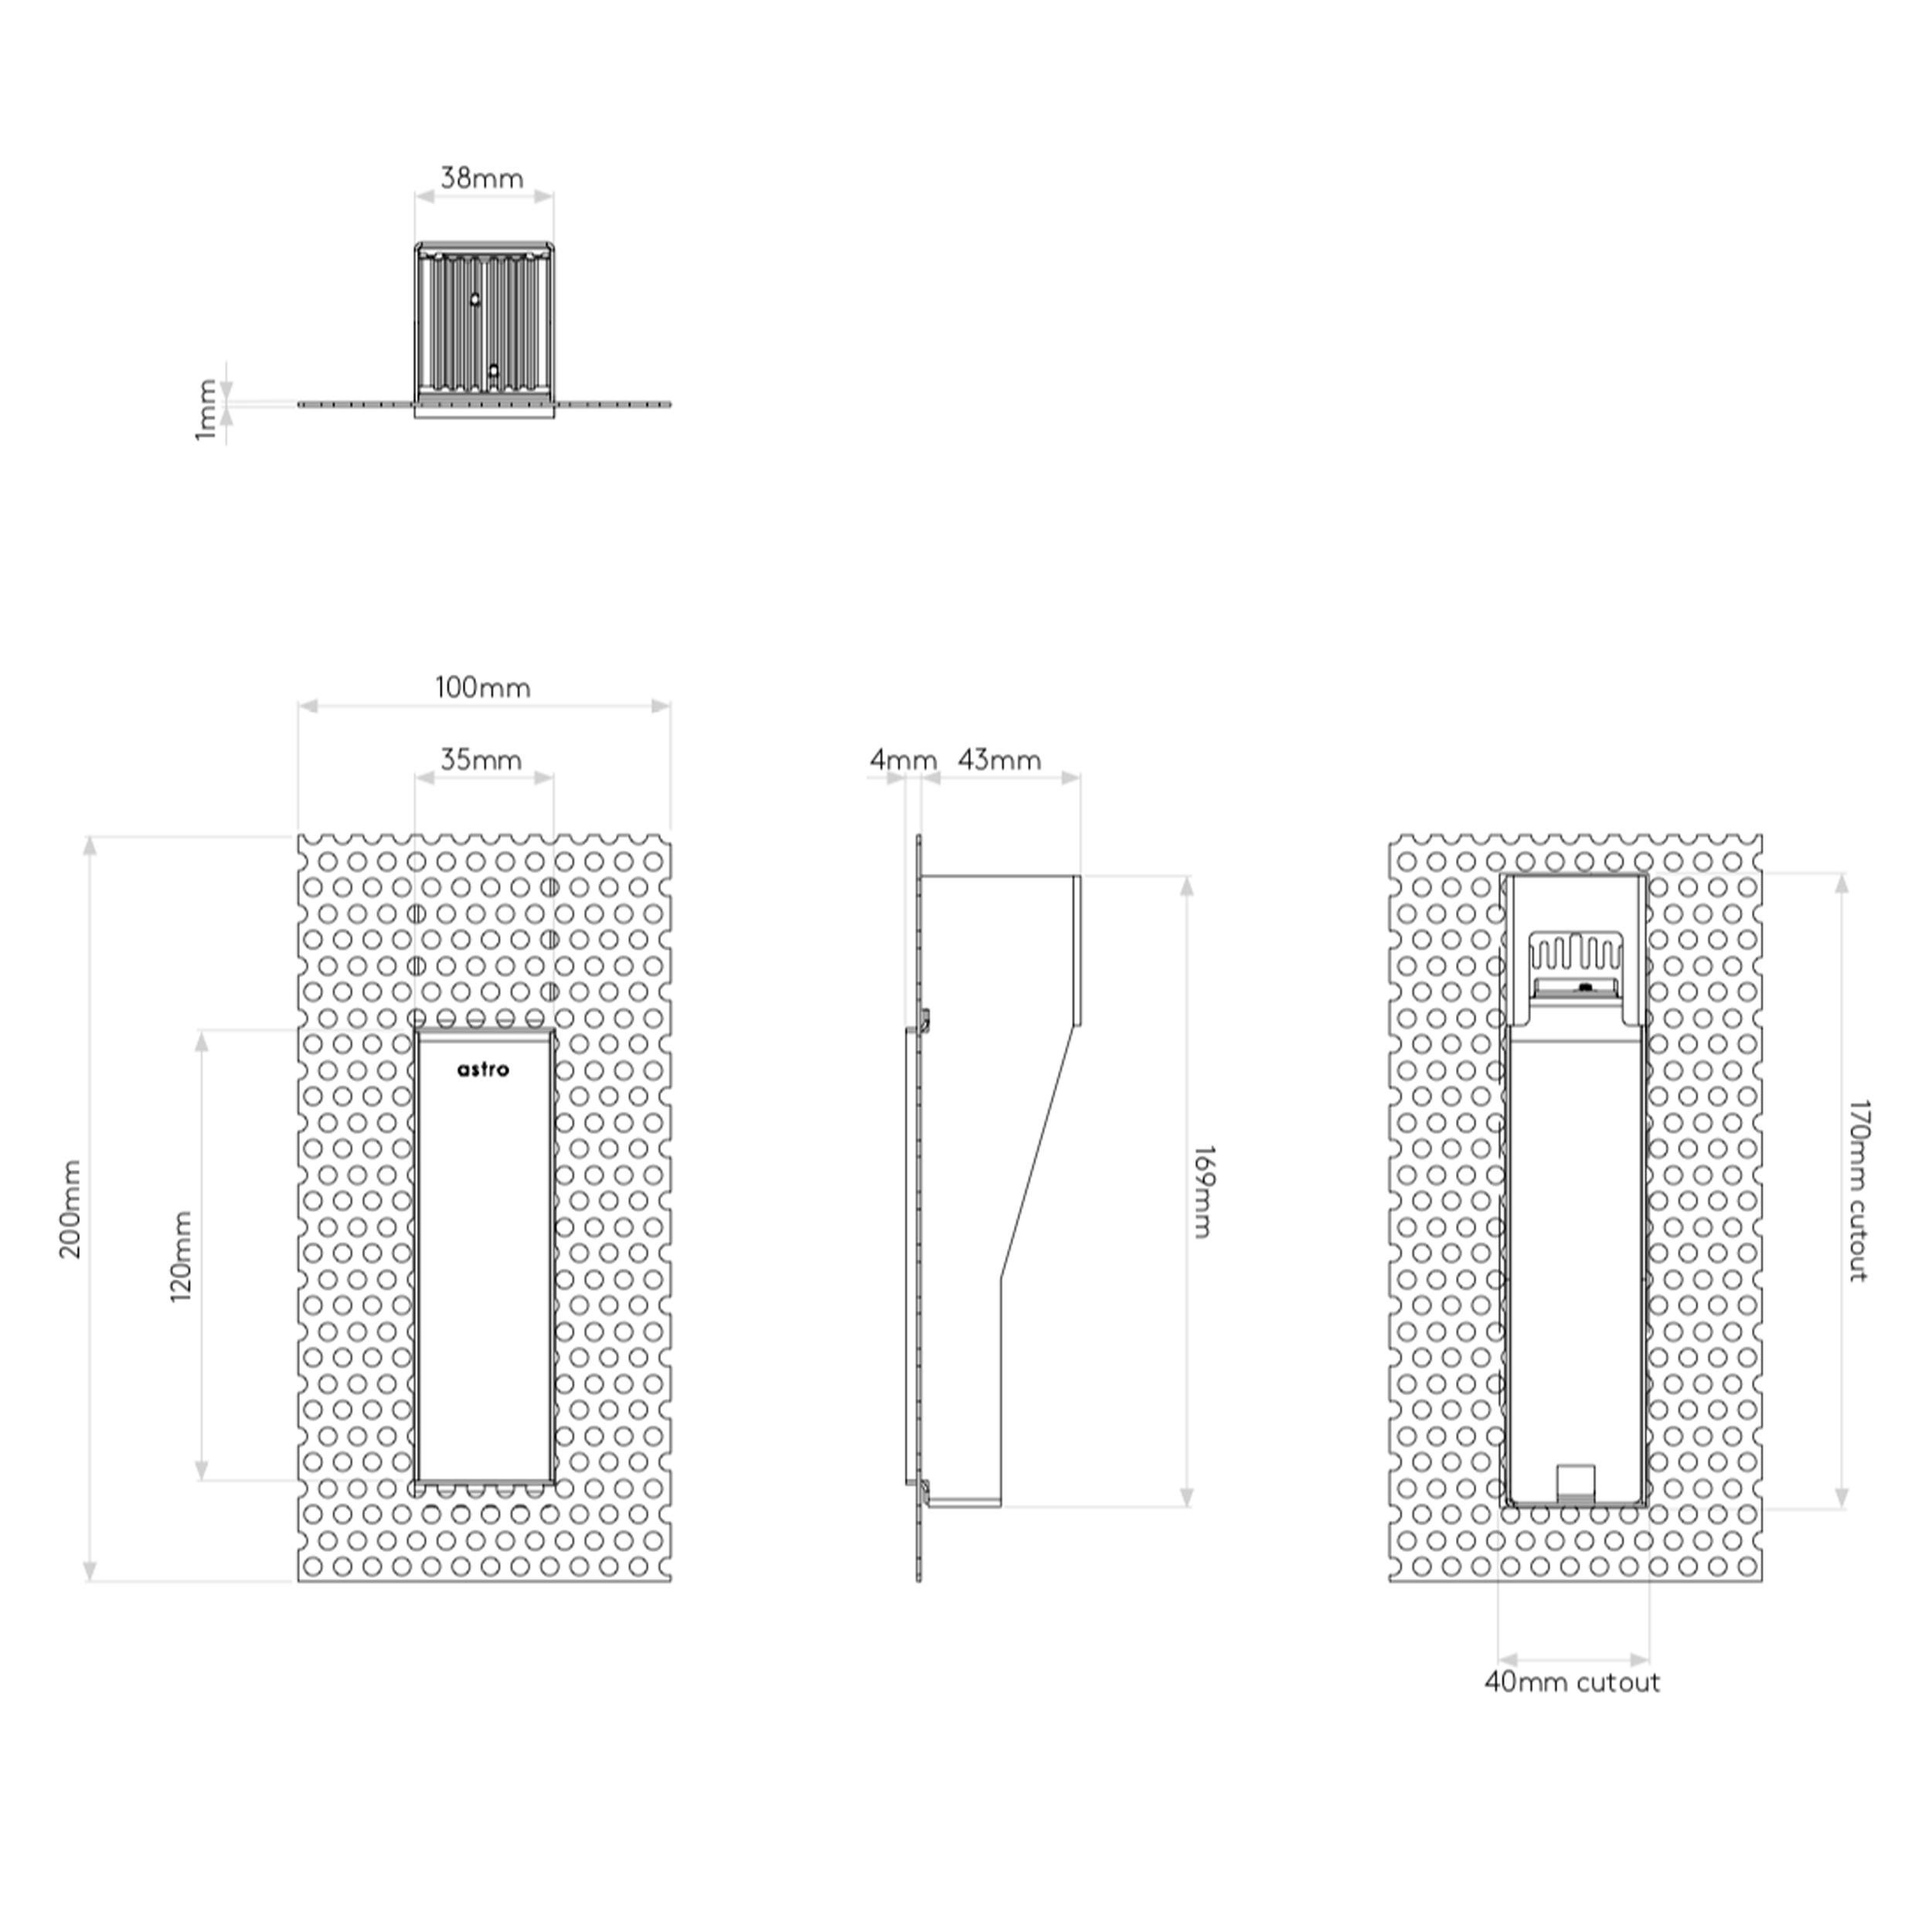 Astro Borgo Trimless 35 Wall Light Line Drawing